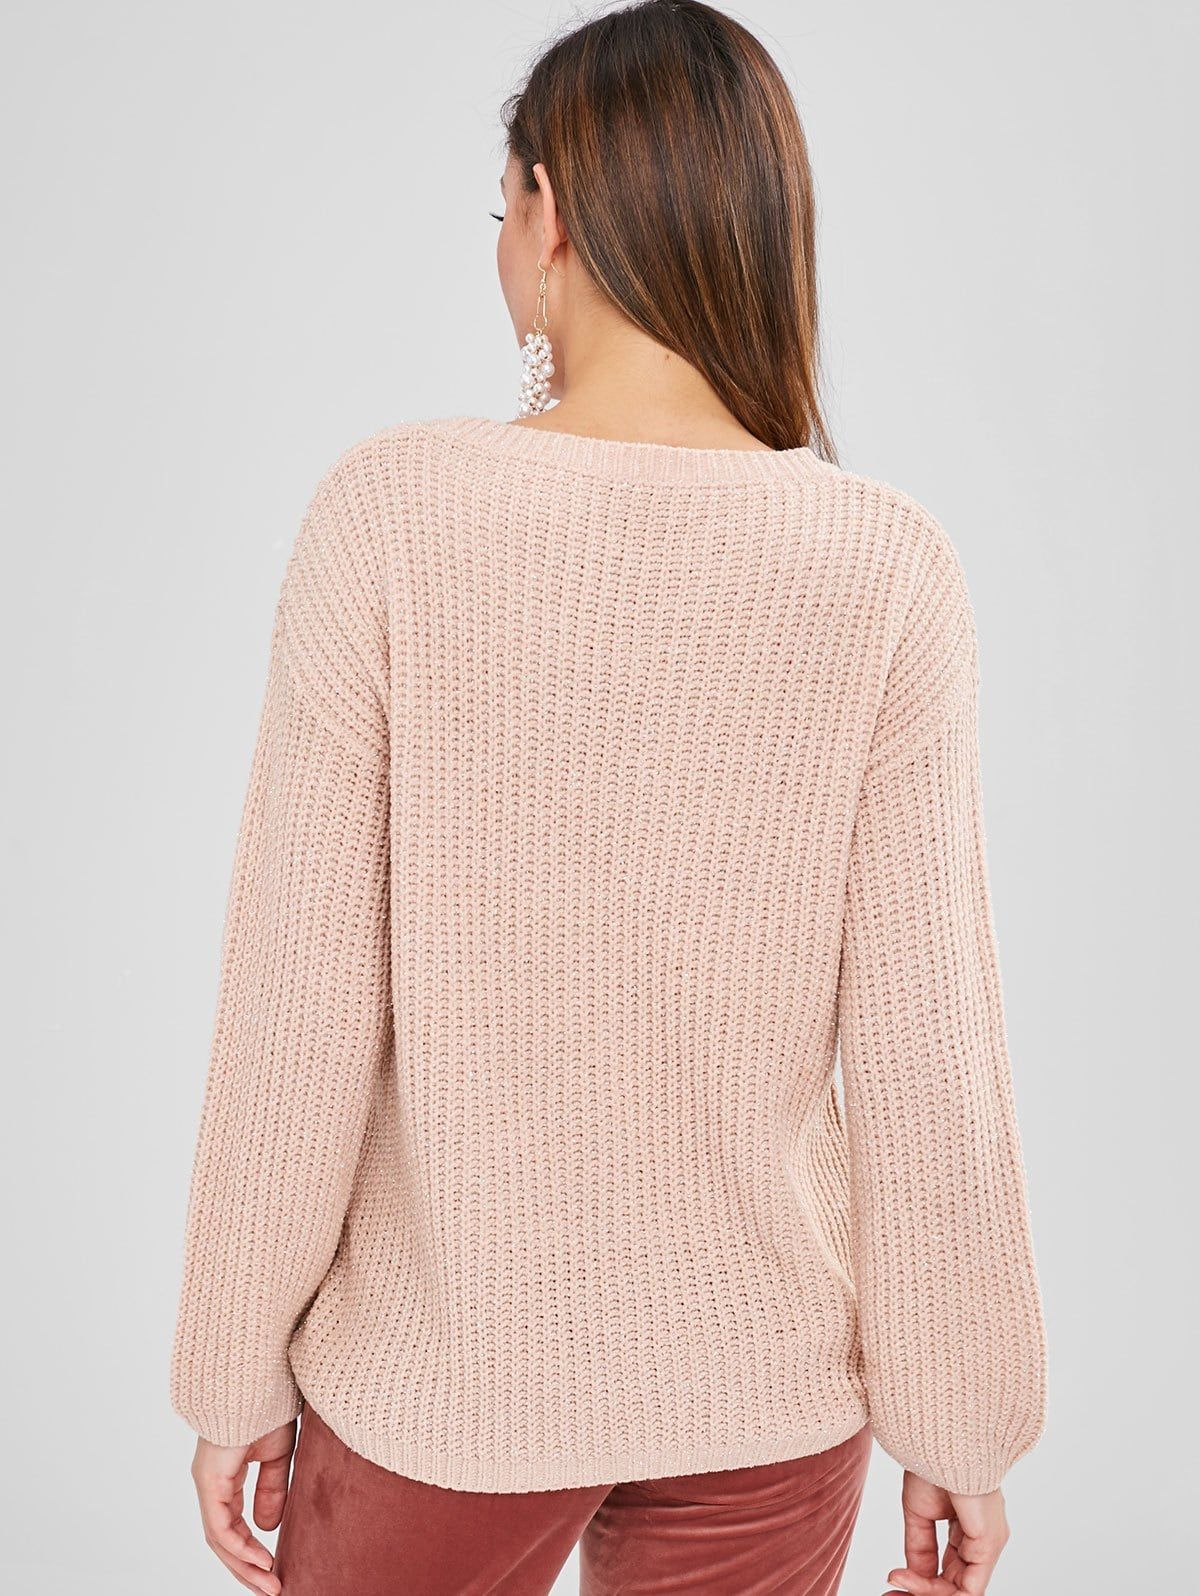 High Low Shiny Thread Sweater Light Pink Fashion Long Sweater Dress Sweaters